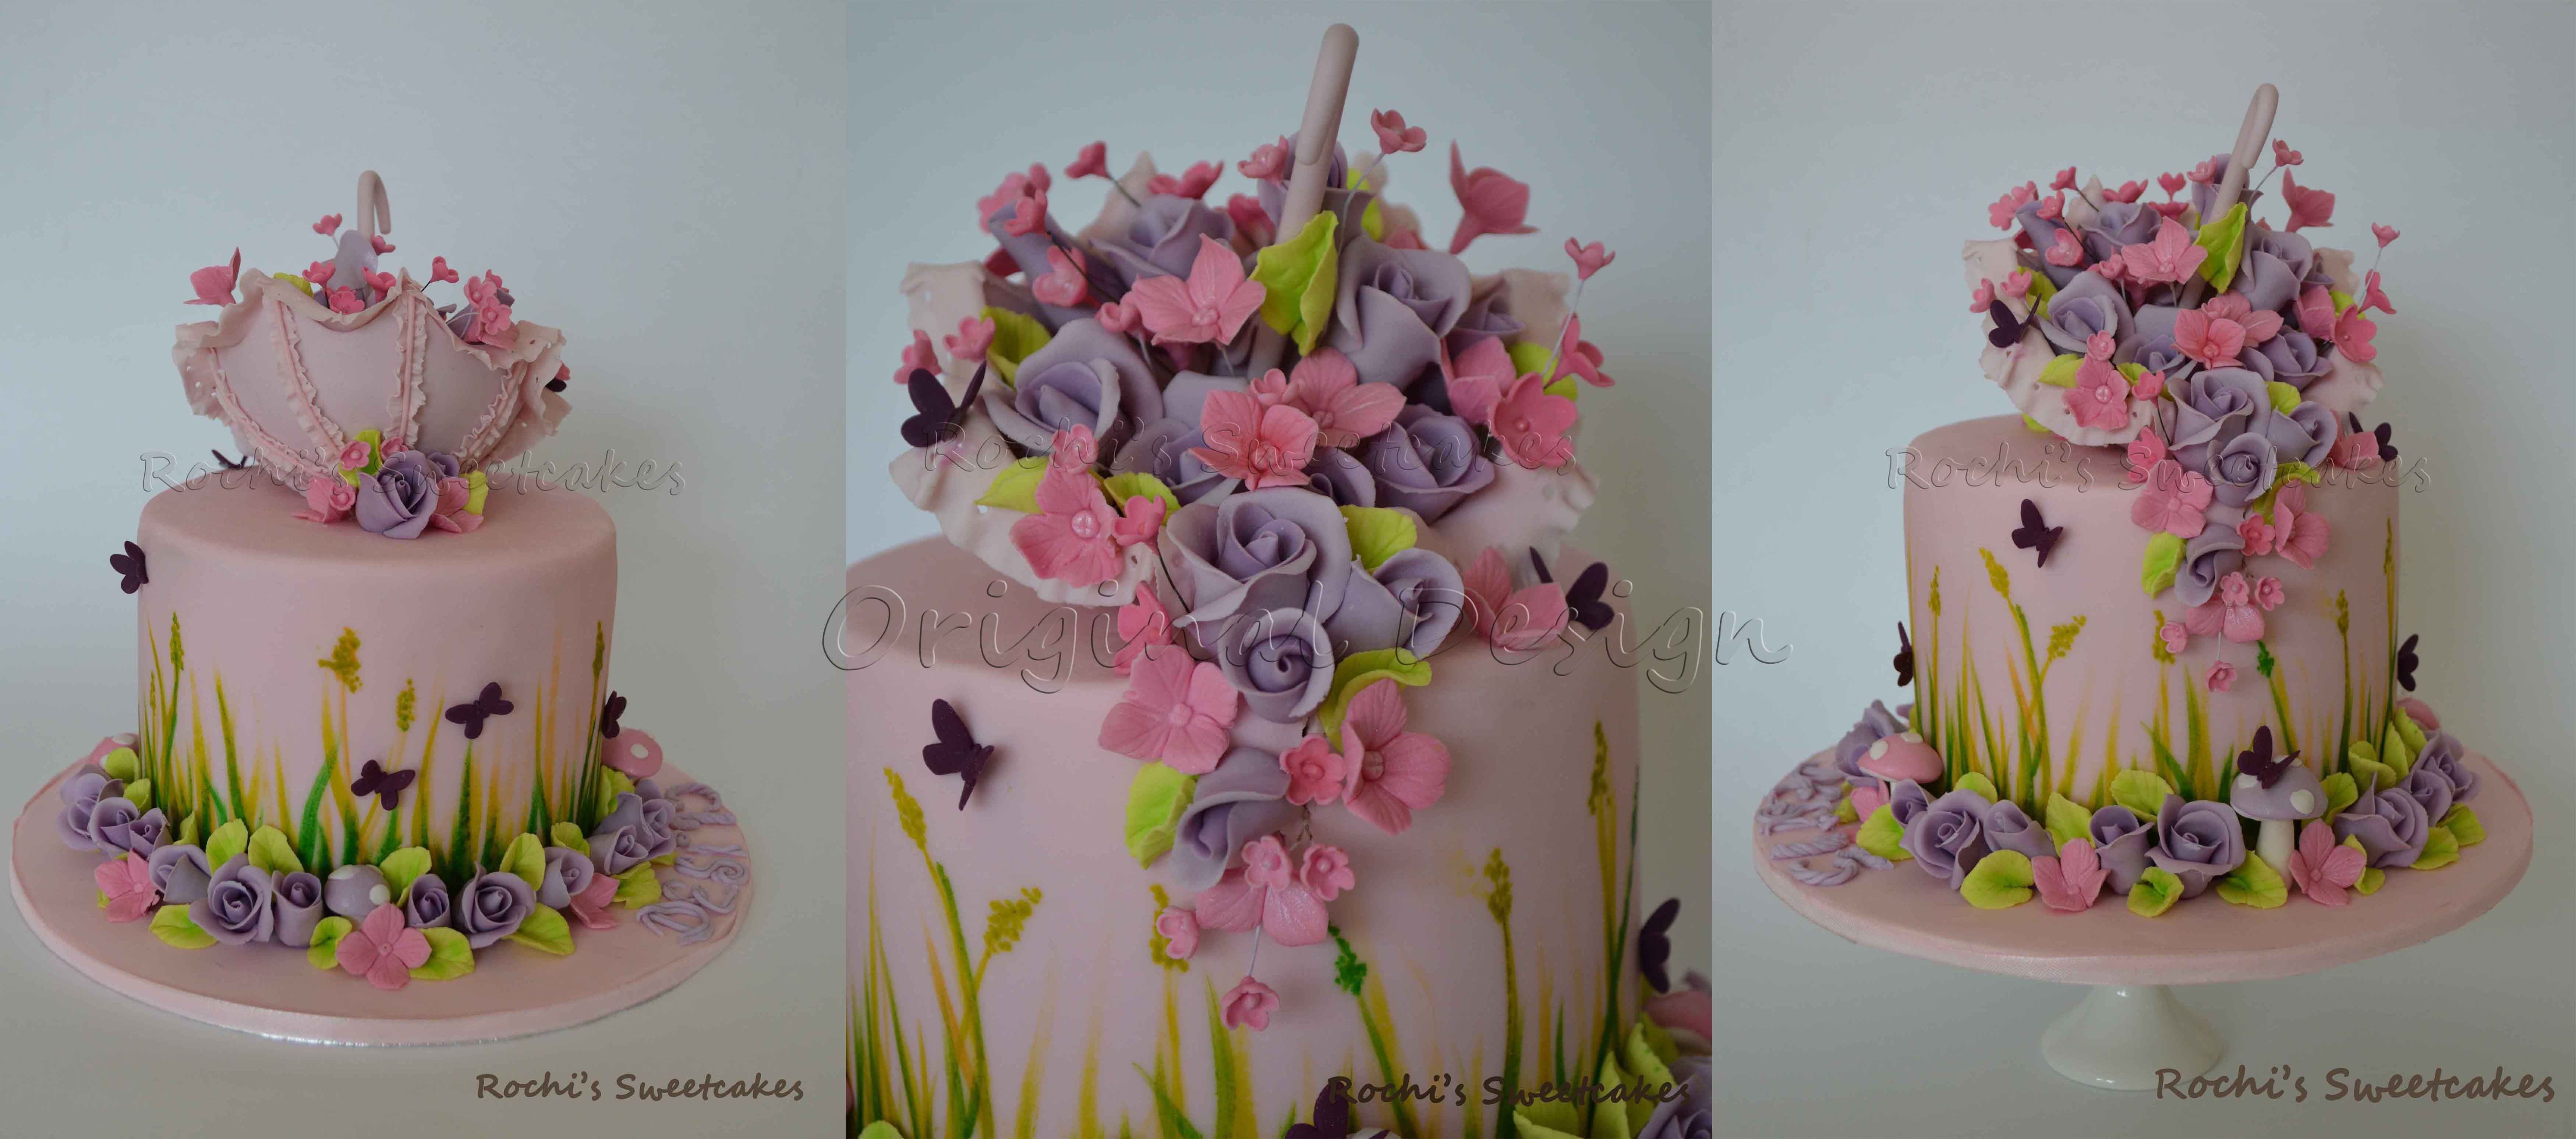 Umbrella With Images Cake Beautiful Cakes Cute Cakes